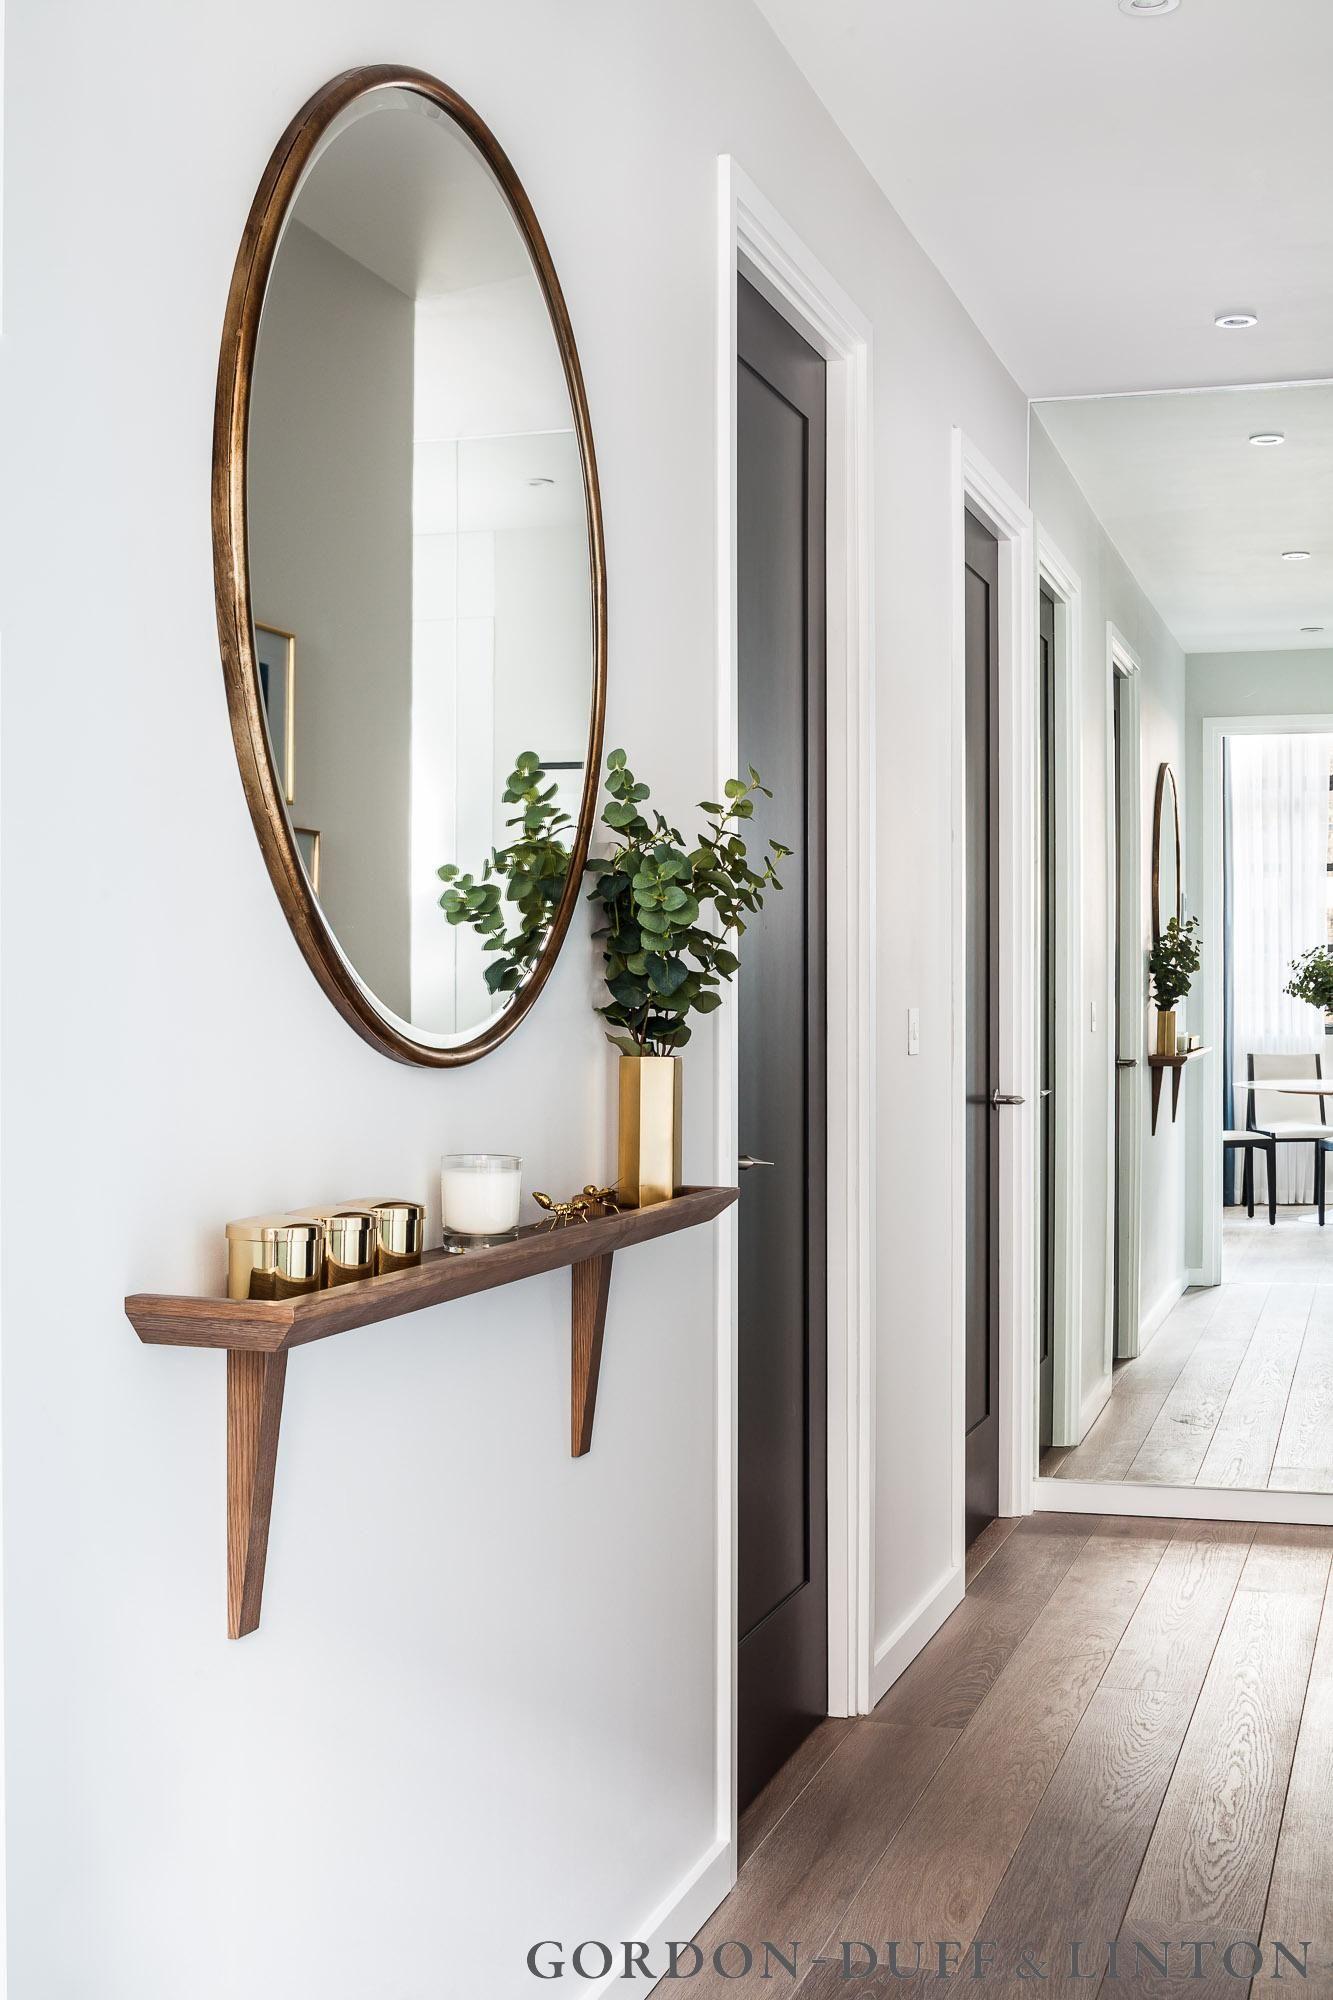 Small hallway furniture  narrow hallway shelf  עיצוב  Pinterest  Hallway shelf Shelves